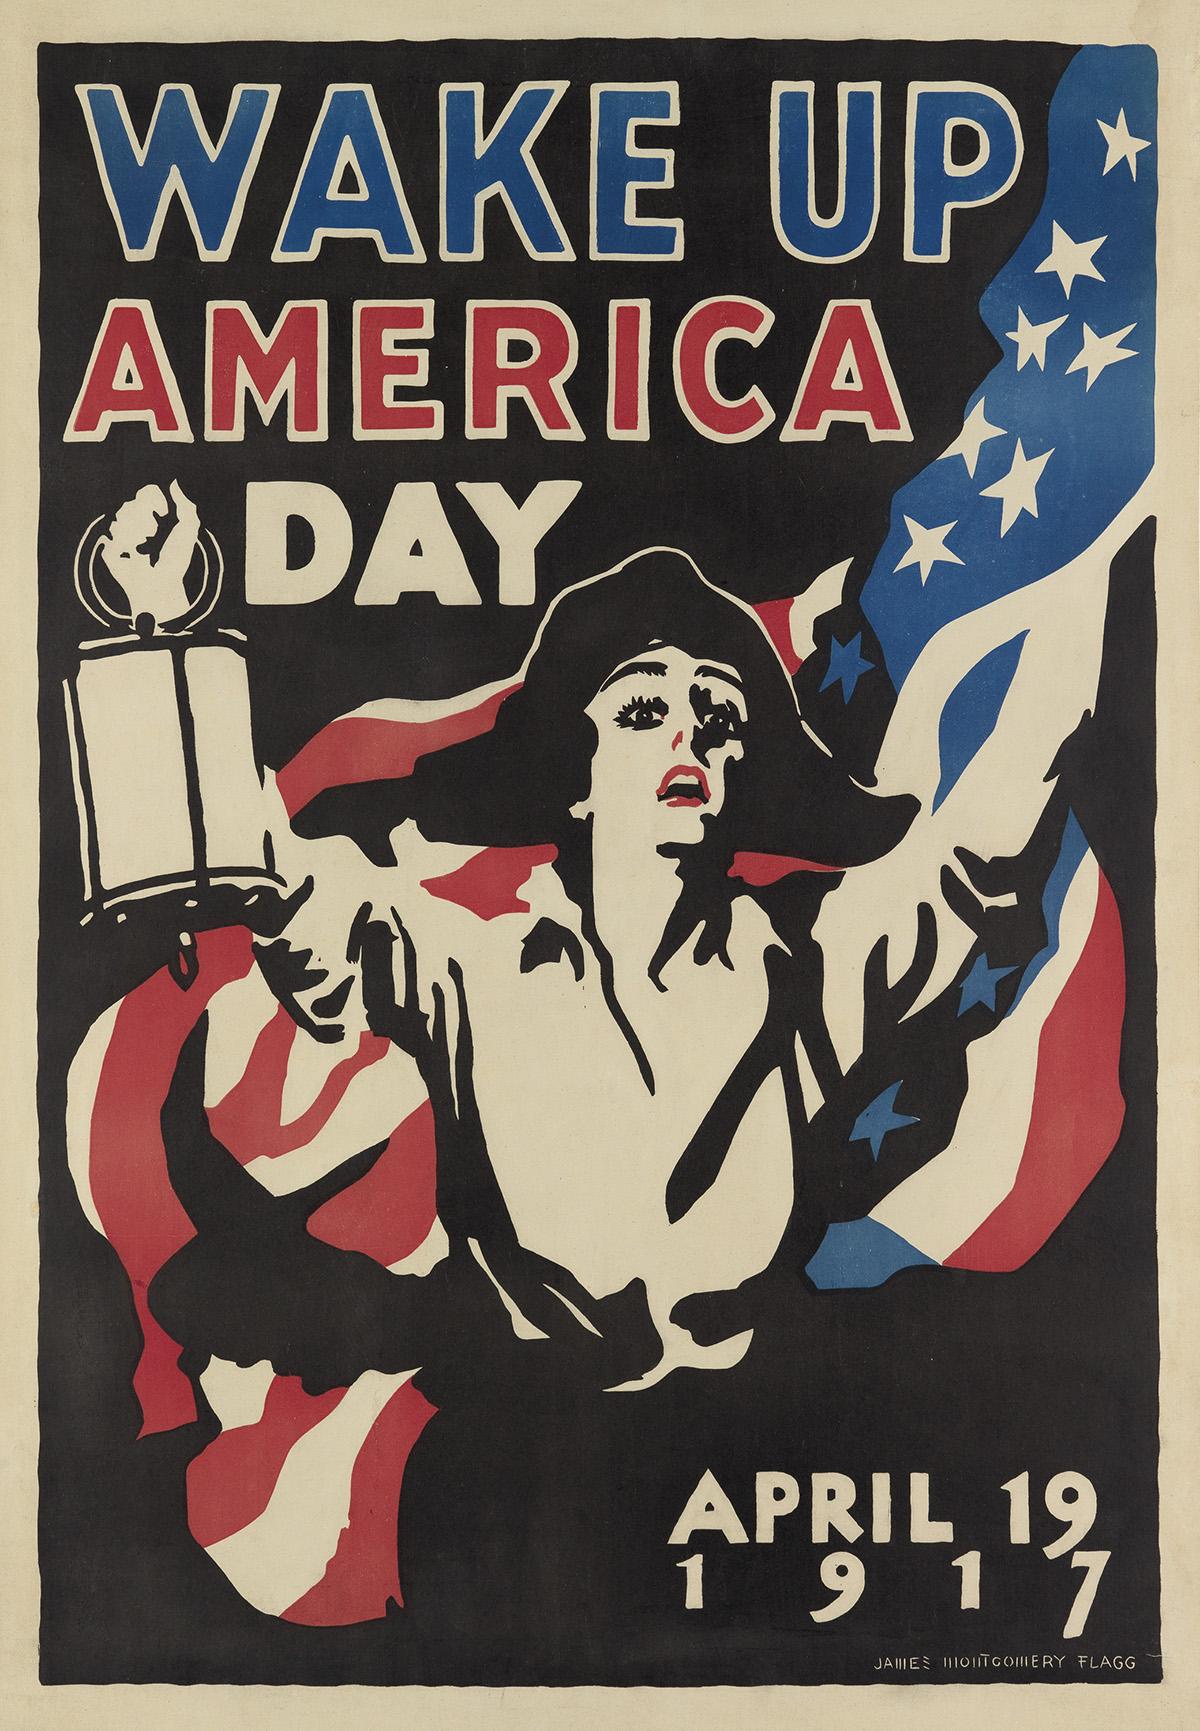 JAMES-MONTGOMERY-FLAGG-(1870-1960)-WAKE-UP-AMERICA-DAY-1917-